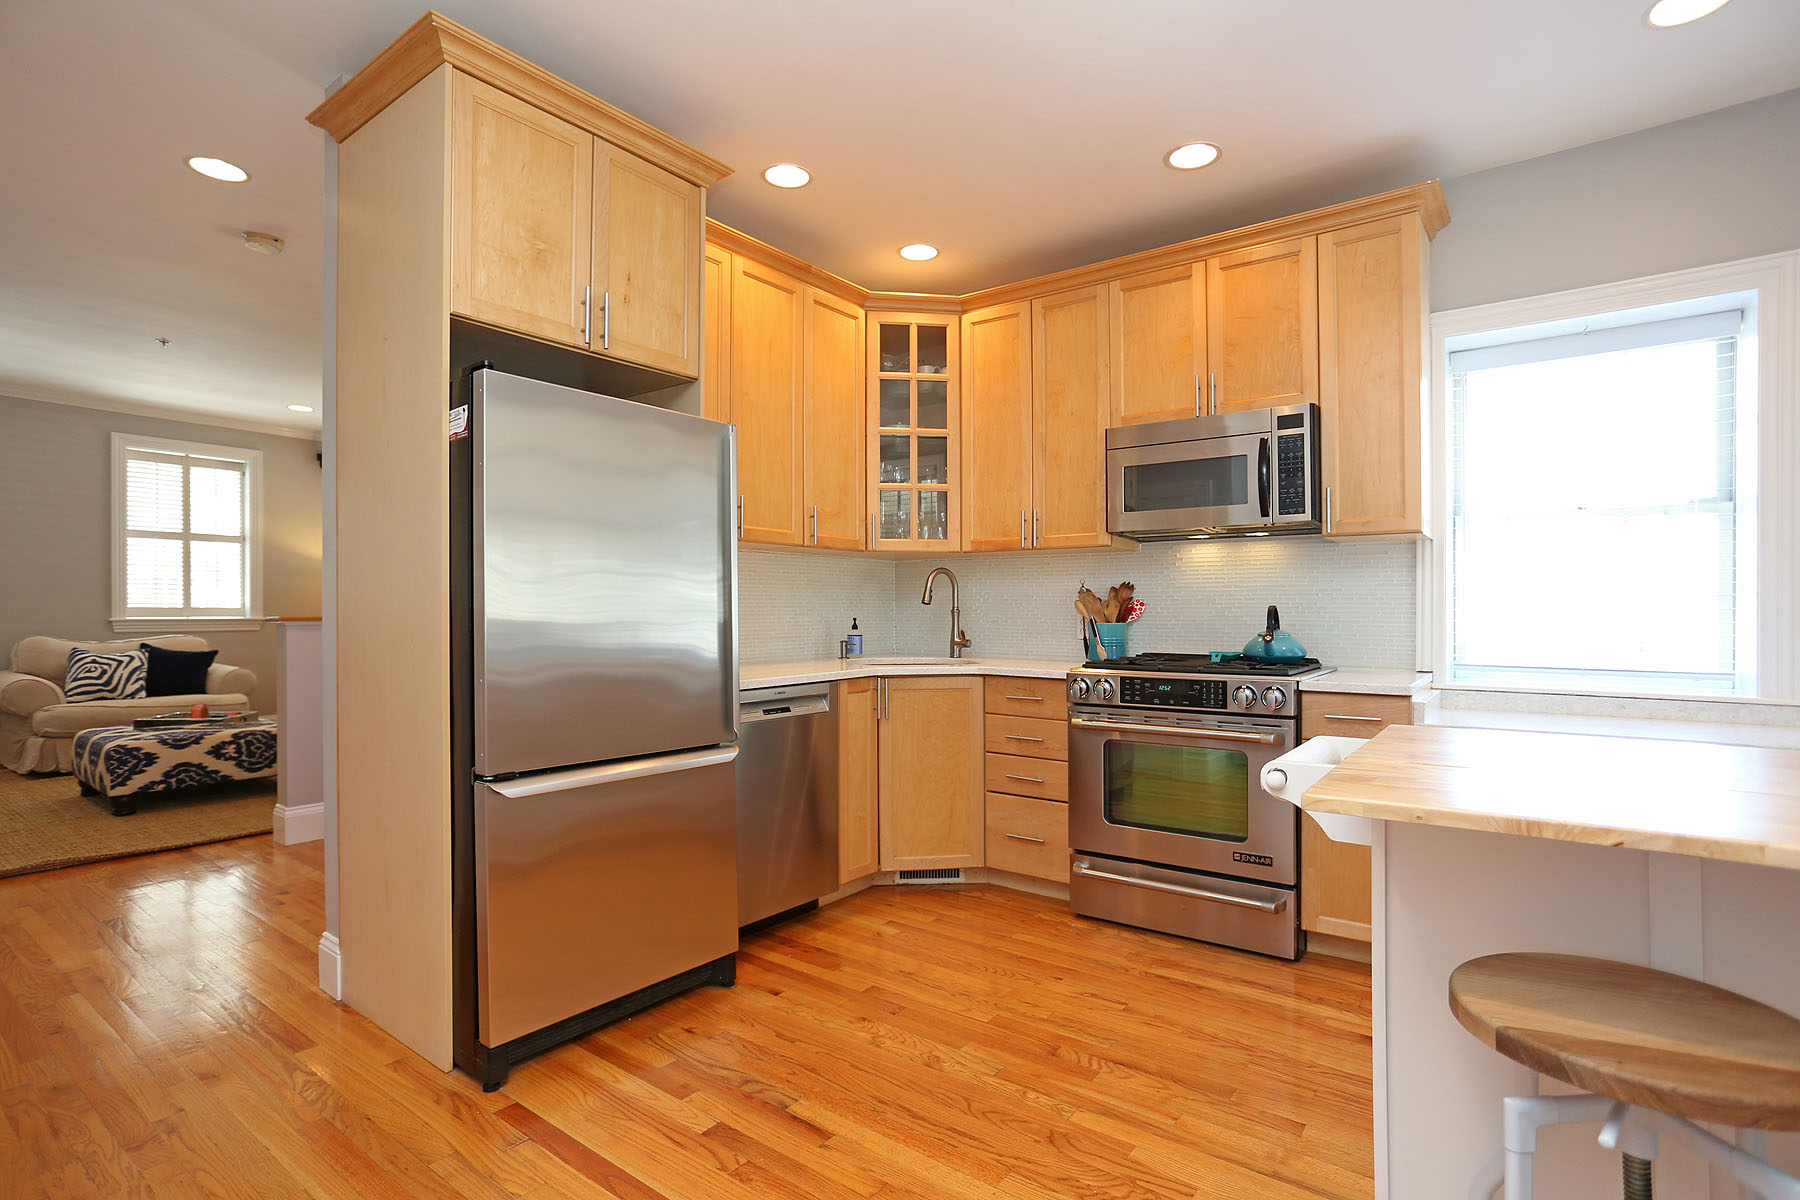 Condominium for Sale at 57 Bartlett Street Unit 1 Charlestown, Boston, Massachusetts 02129 United States